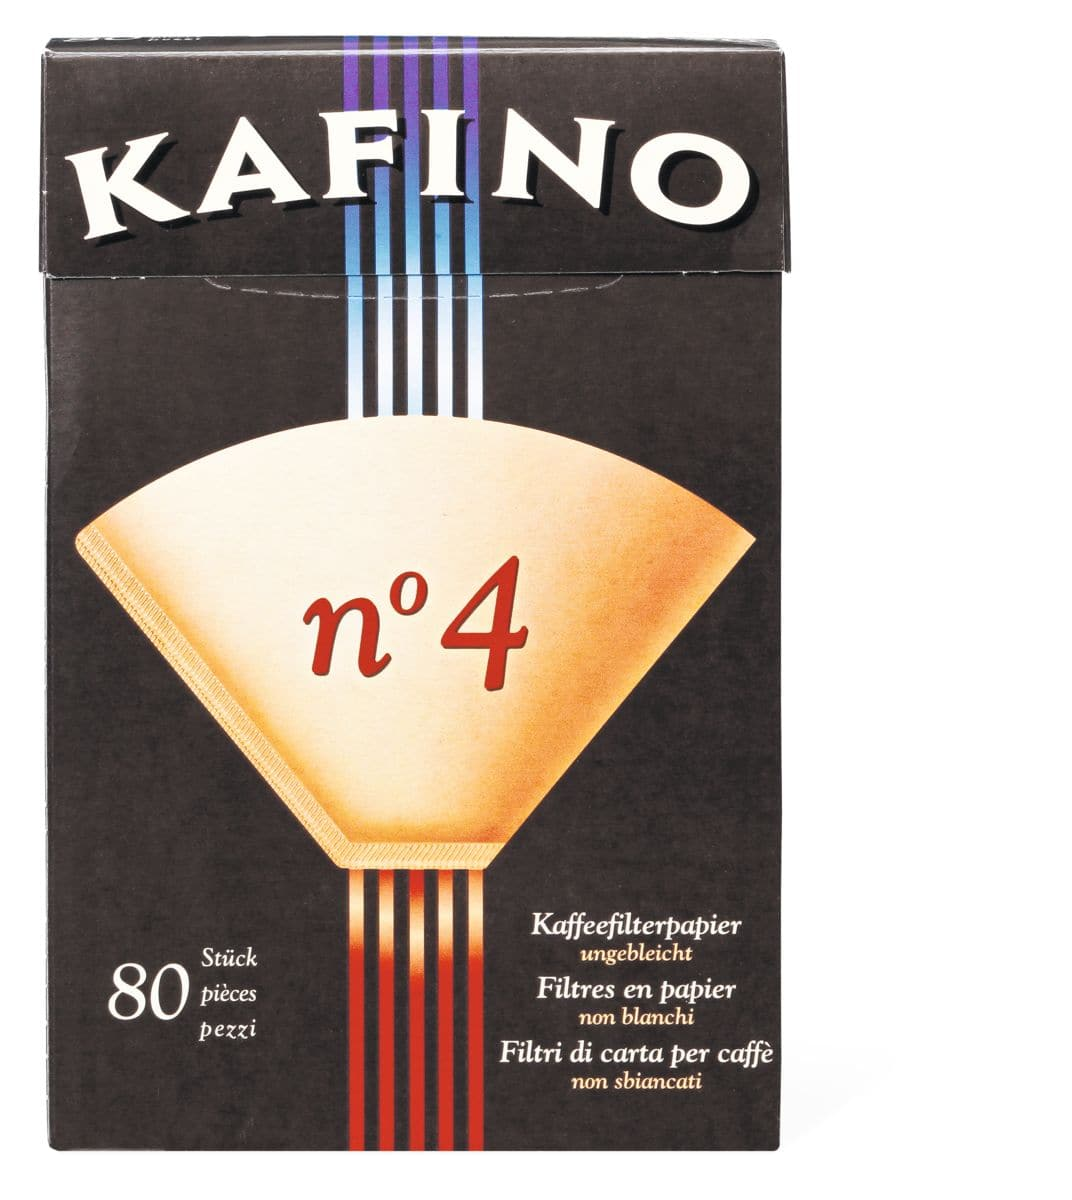 Kafino n°4 Filtres papier